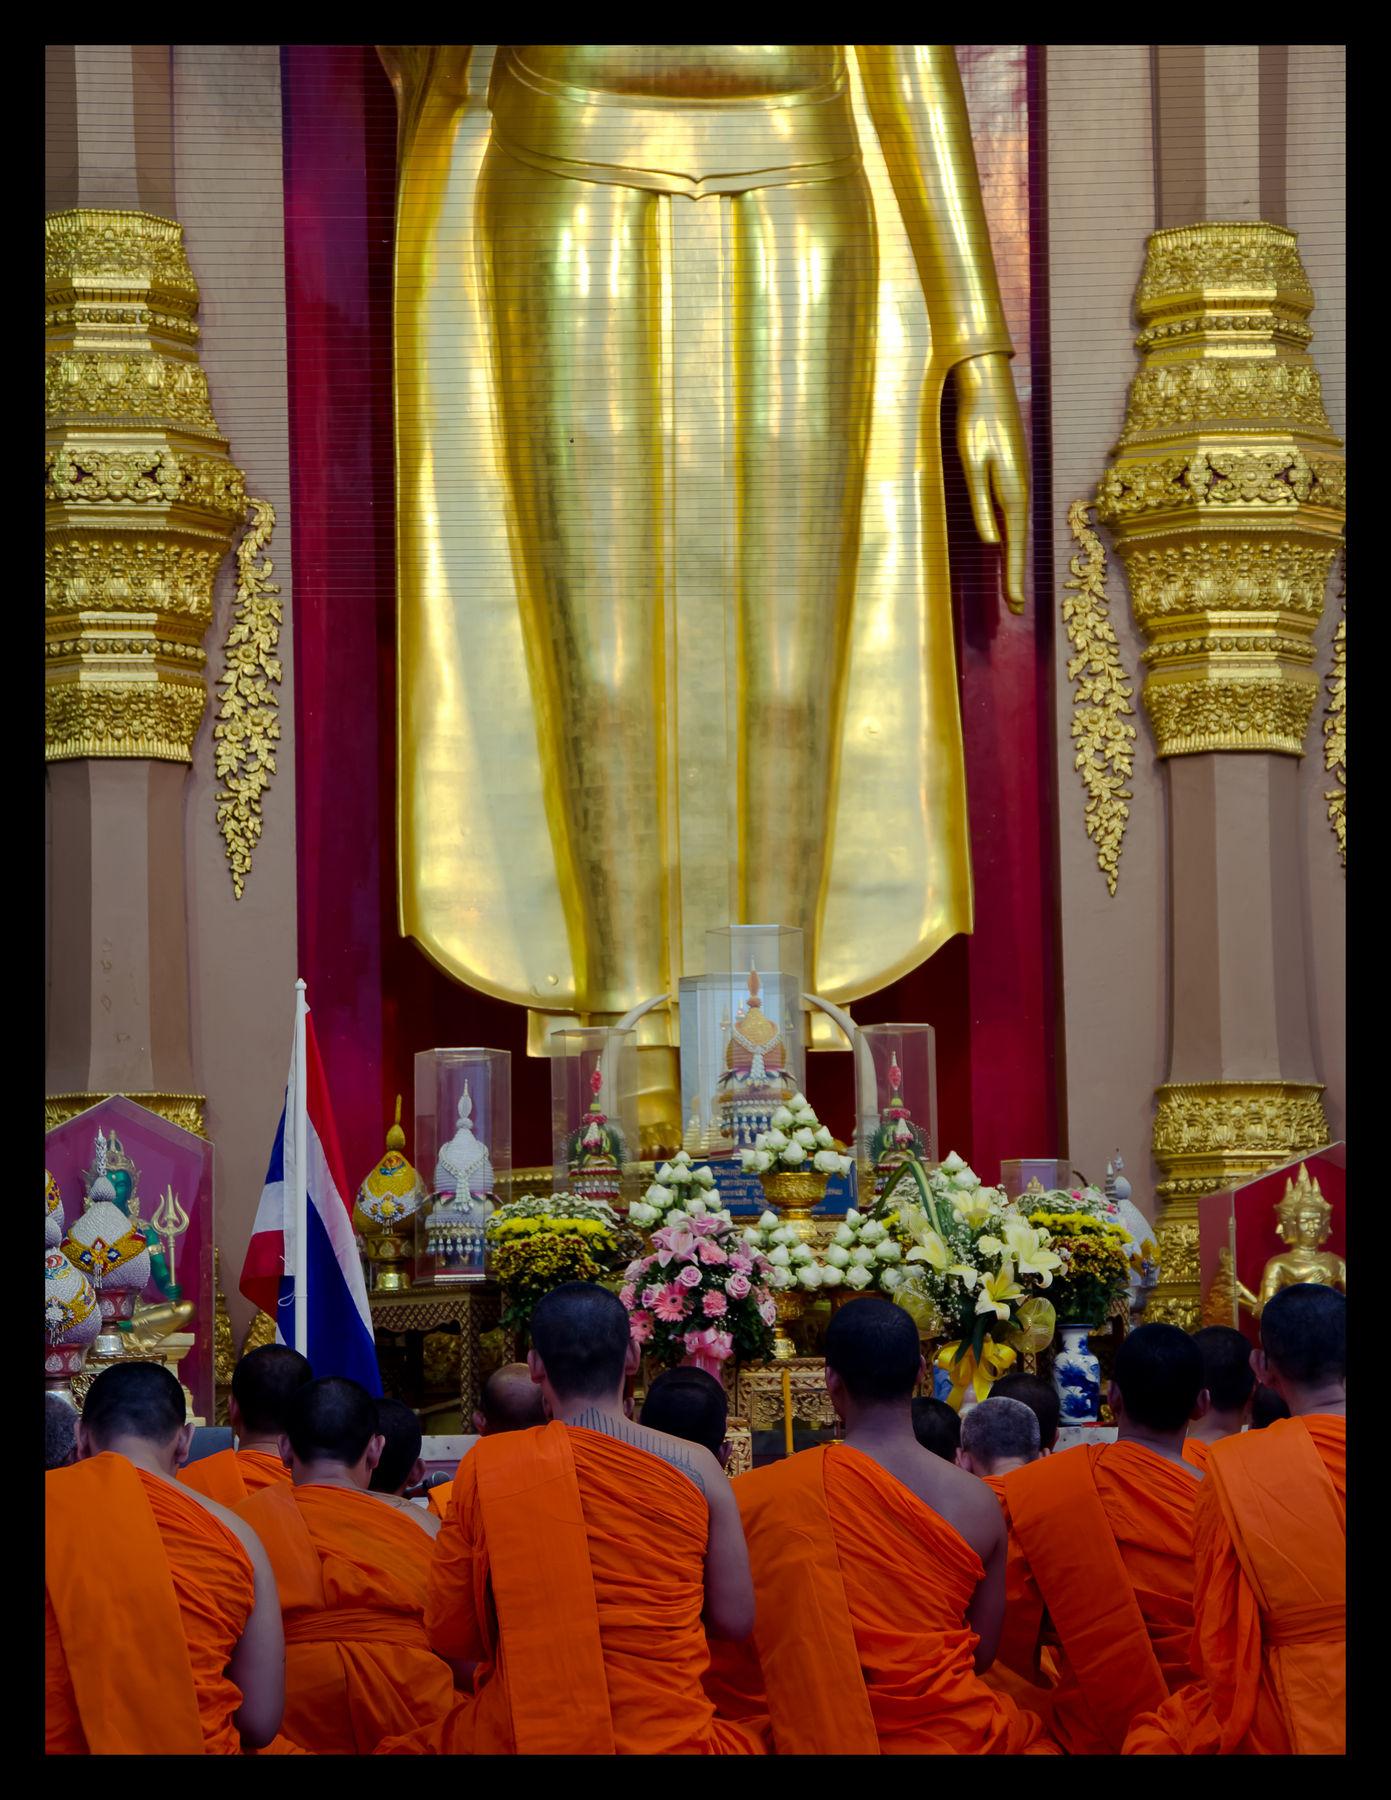 Monks_at_wat